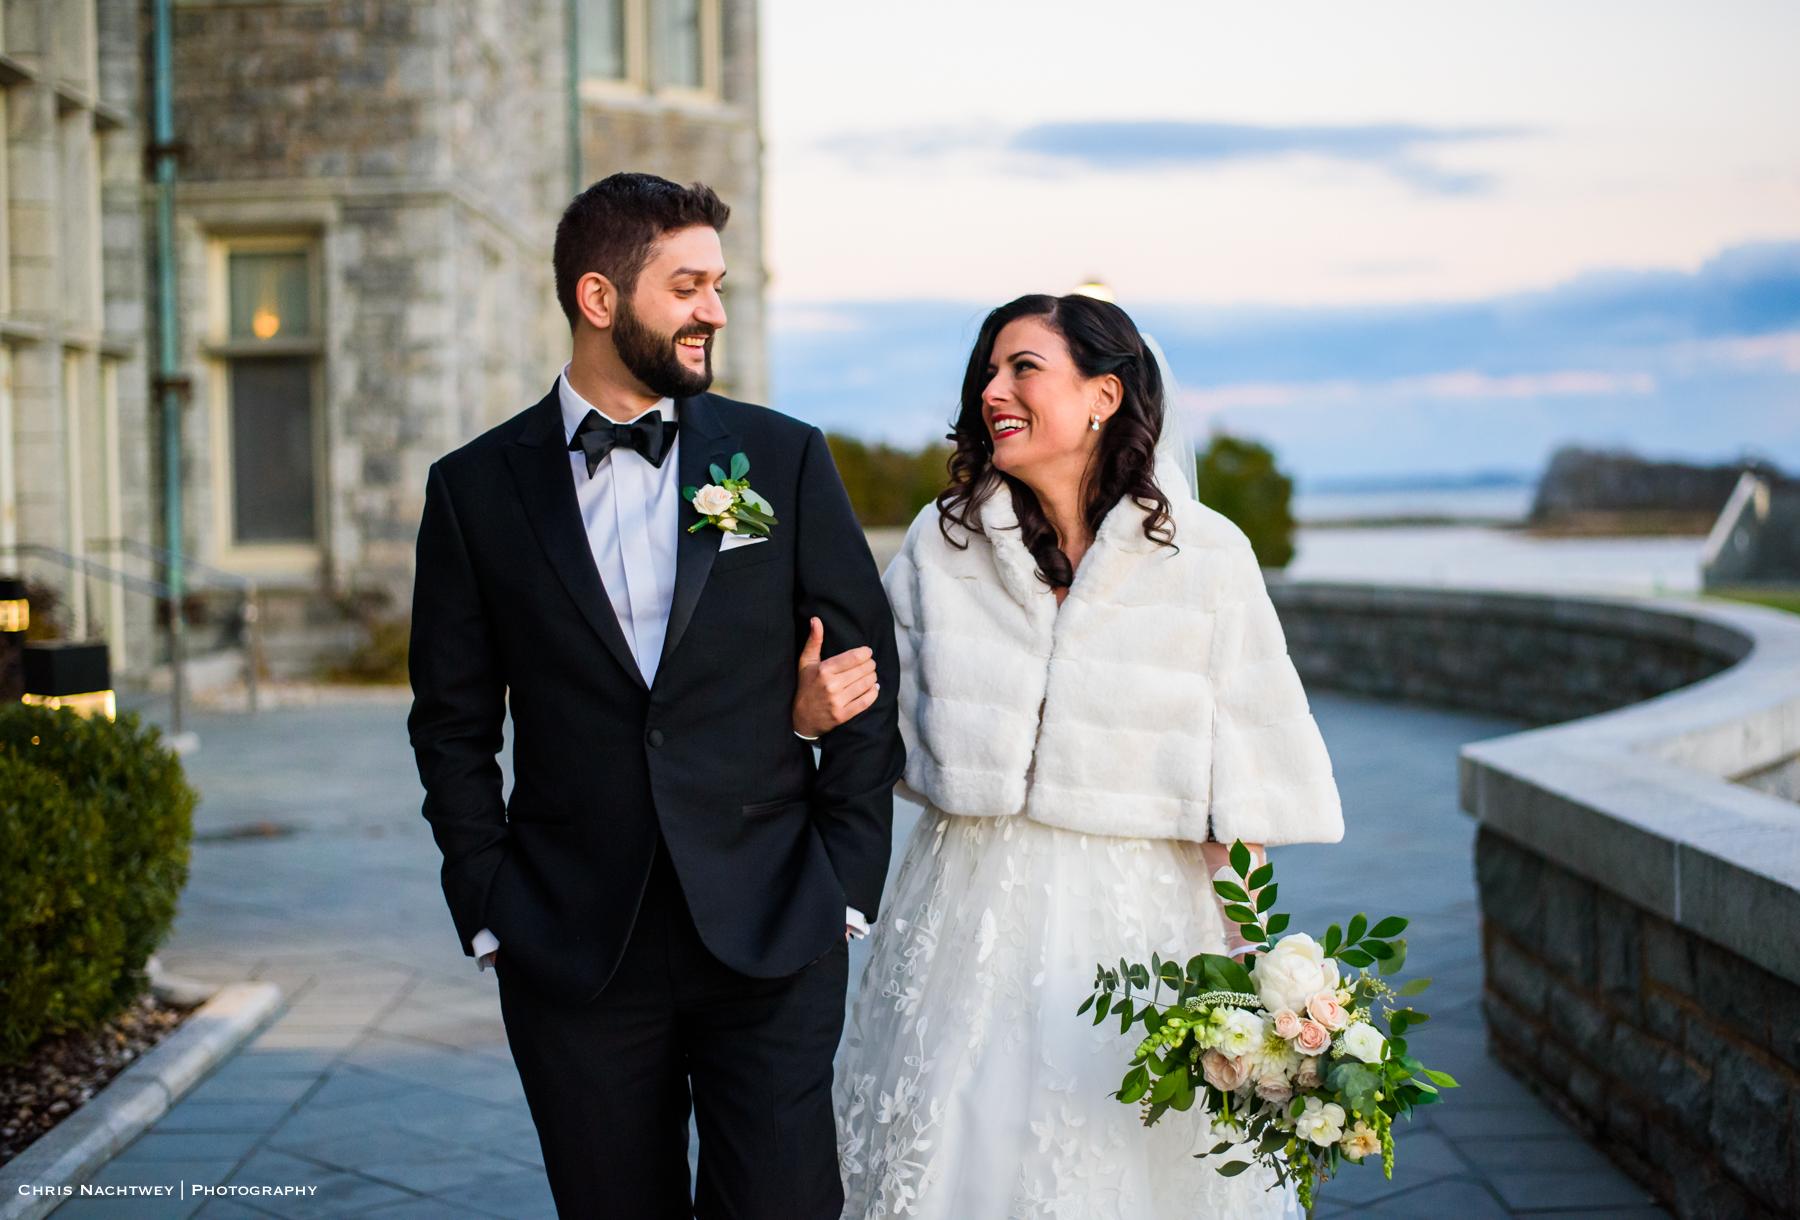 winter-branford-house-wedding-photos-groton-ct-chris-nachtwey-photography-2019-27.jpg